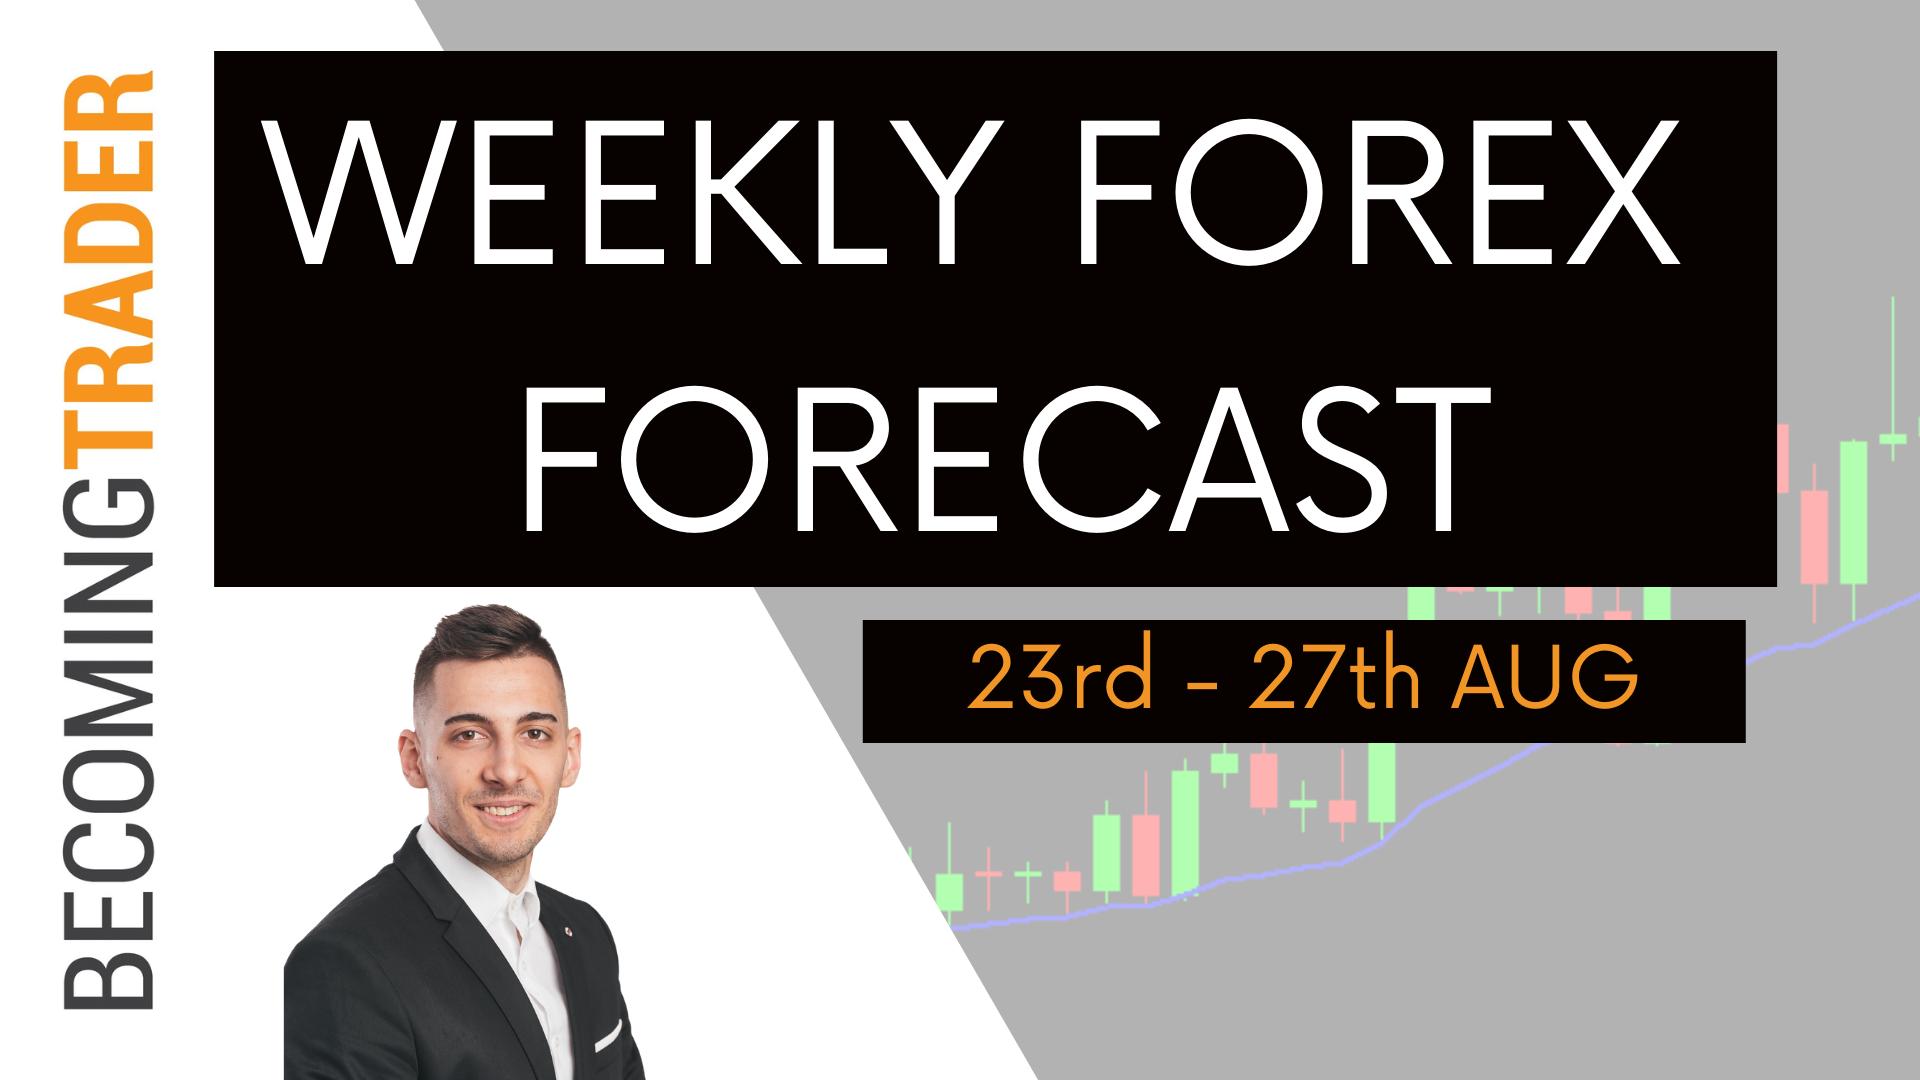 Weekly Forex Forecast 23rd to 27th August 2021 | EURUSD , GBPUSD , AUDUSD , NZDUSD , USDCAD , USDJPY